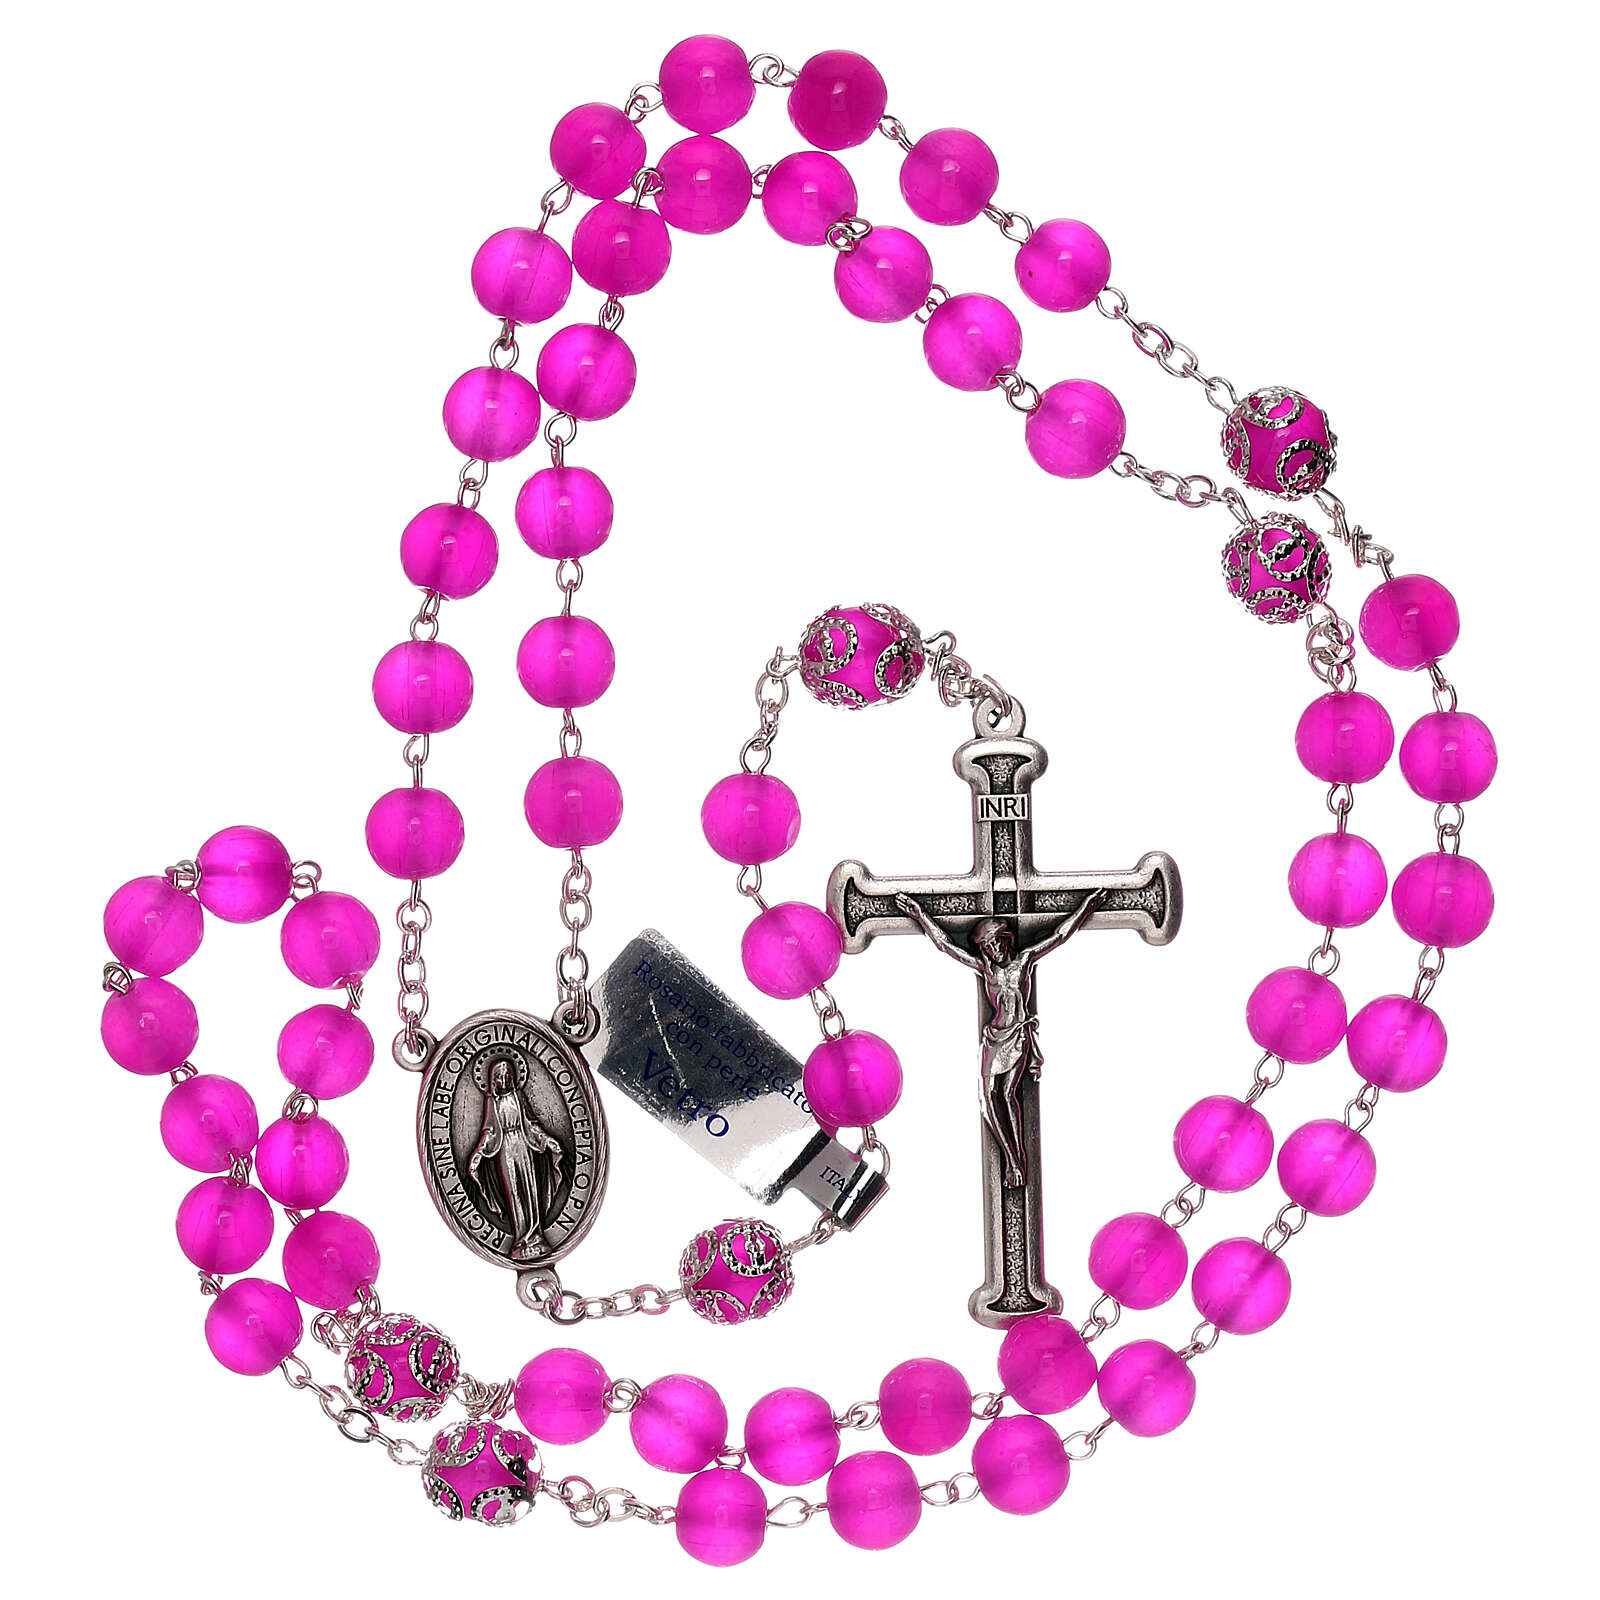 Rosary polished fuchsia glass 5 mm 4